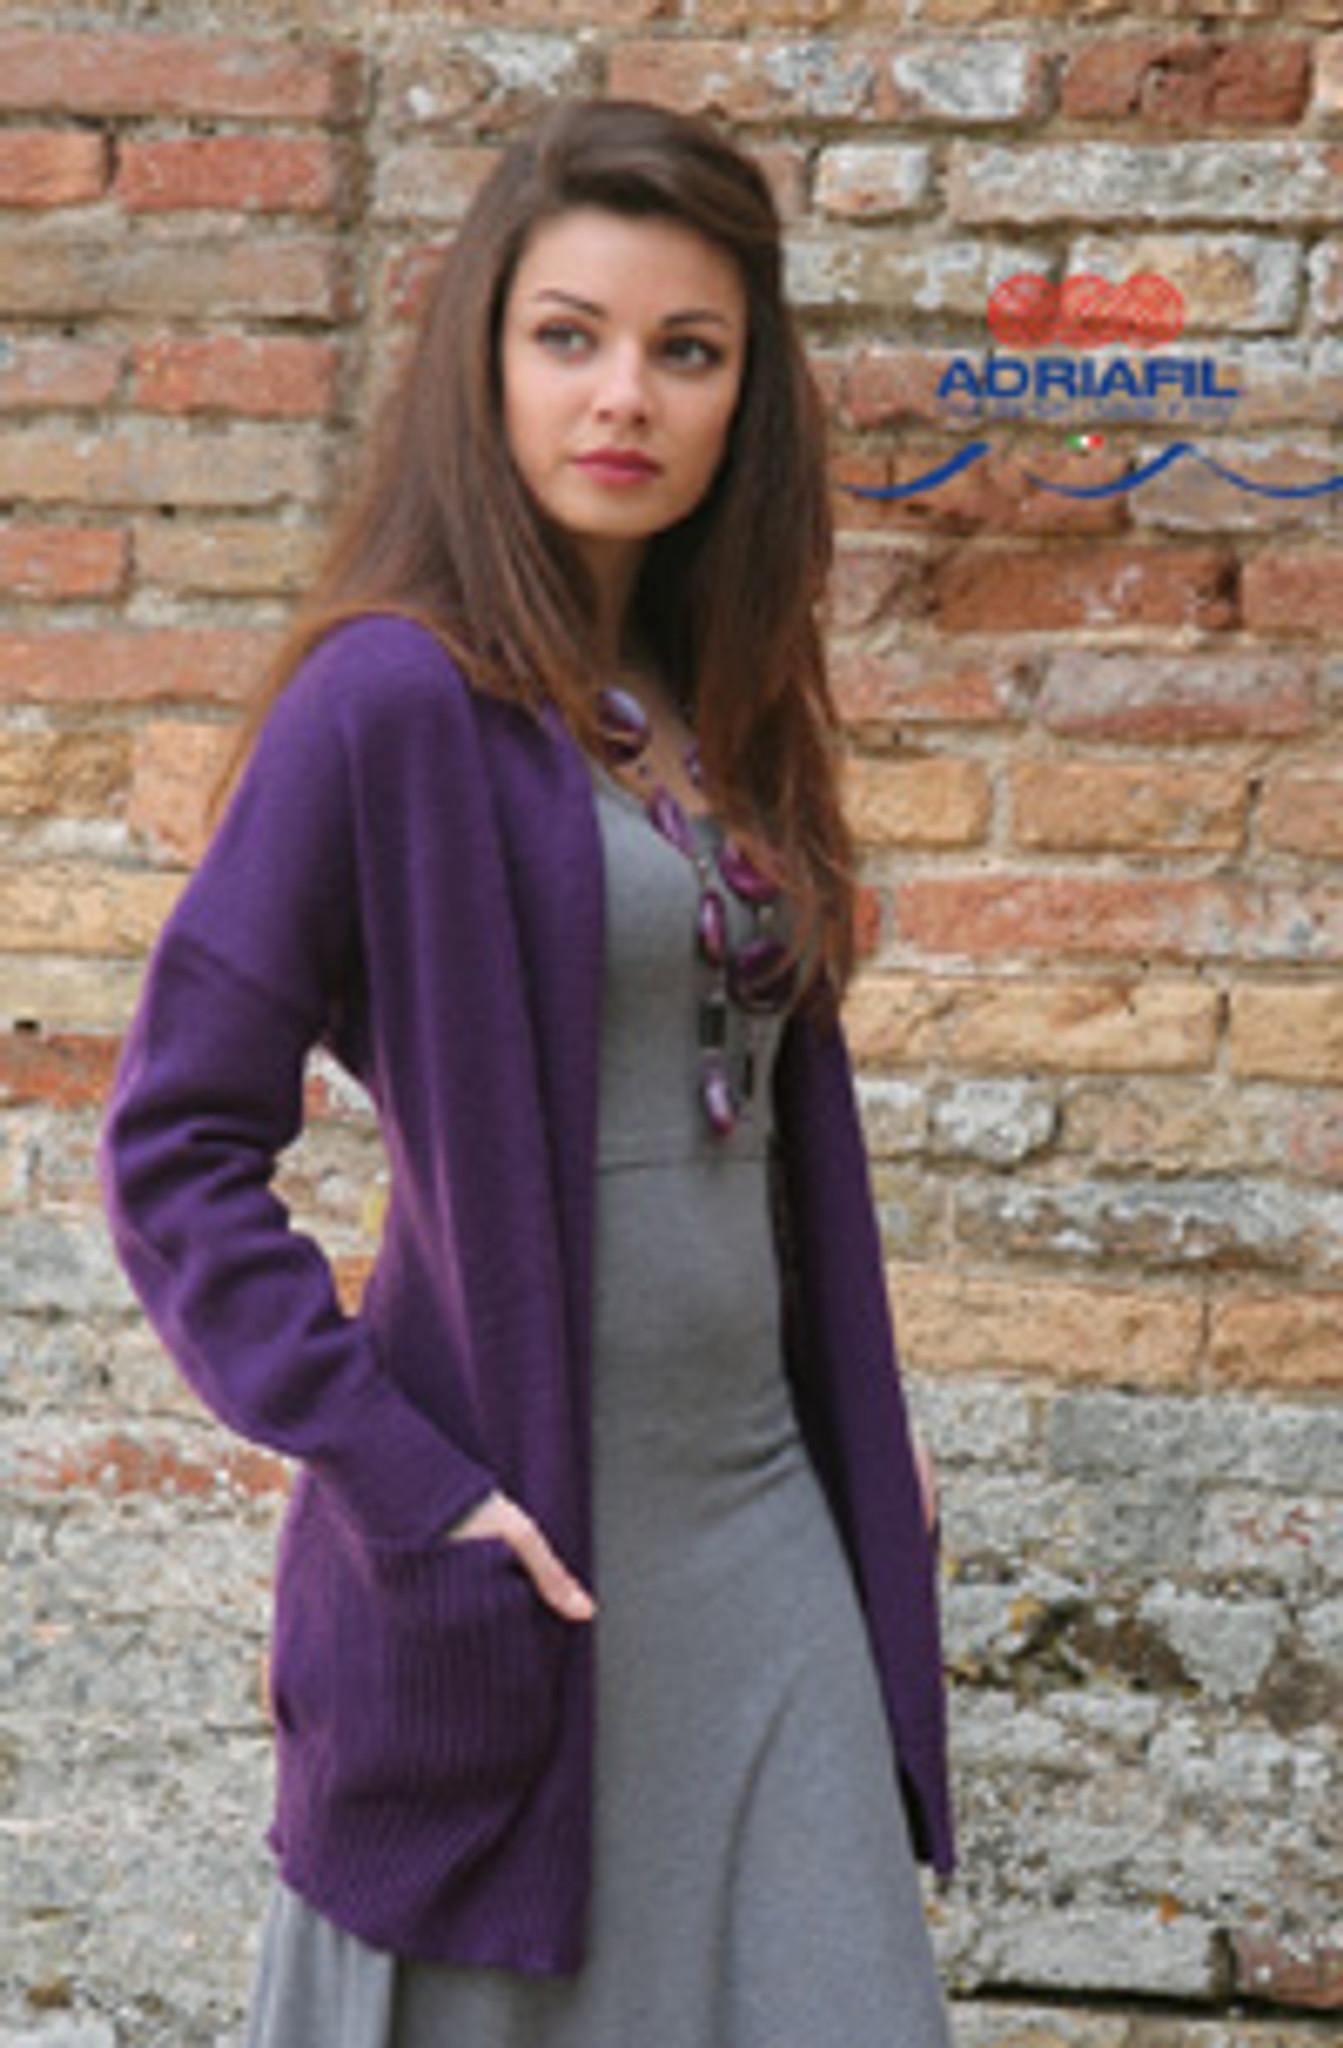 Ladies Cardigan Pattern | Adriafil Avantgarde - Free